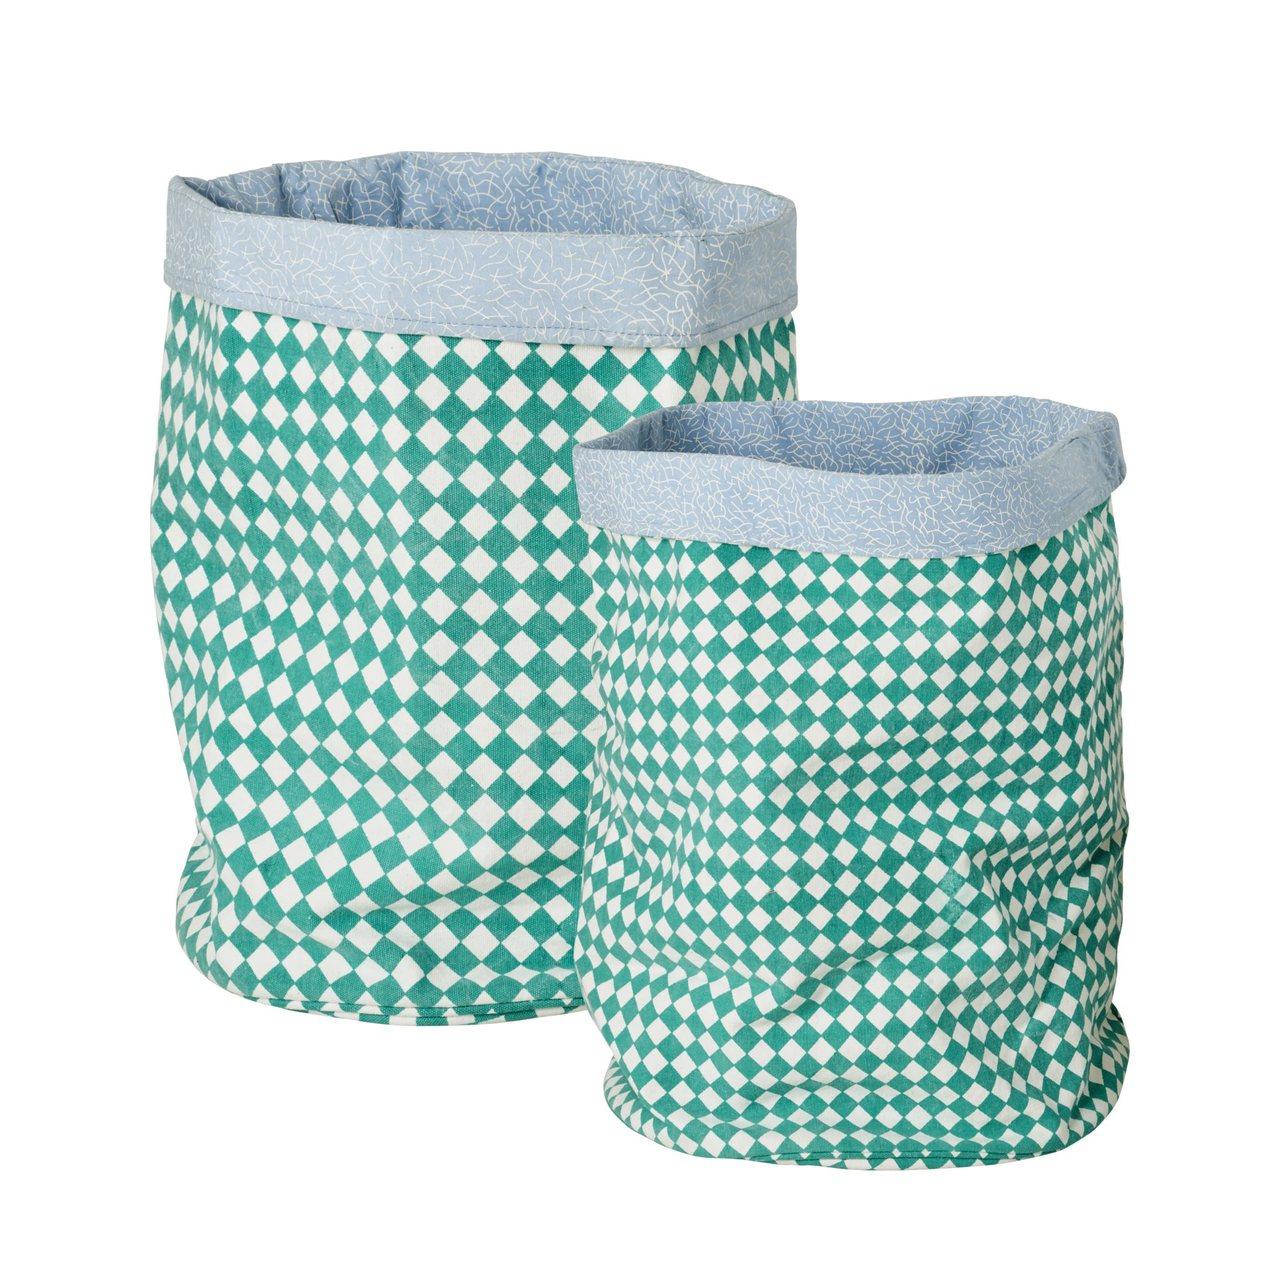 Kids Fabric storage, set of 2